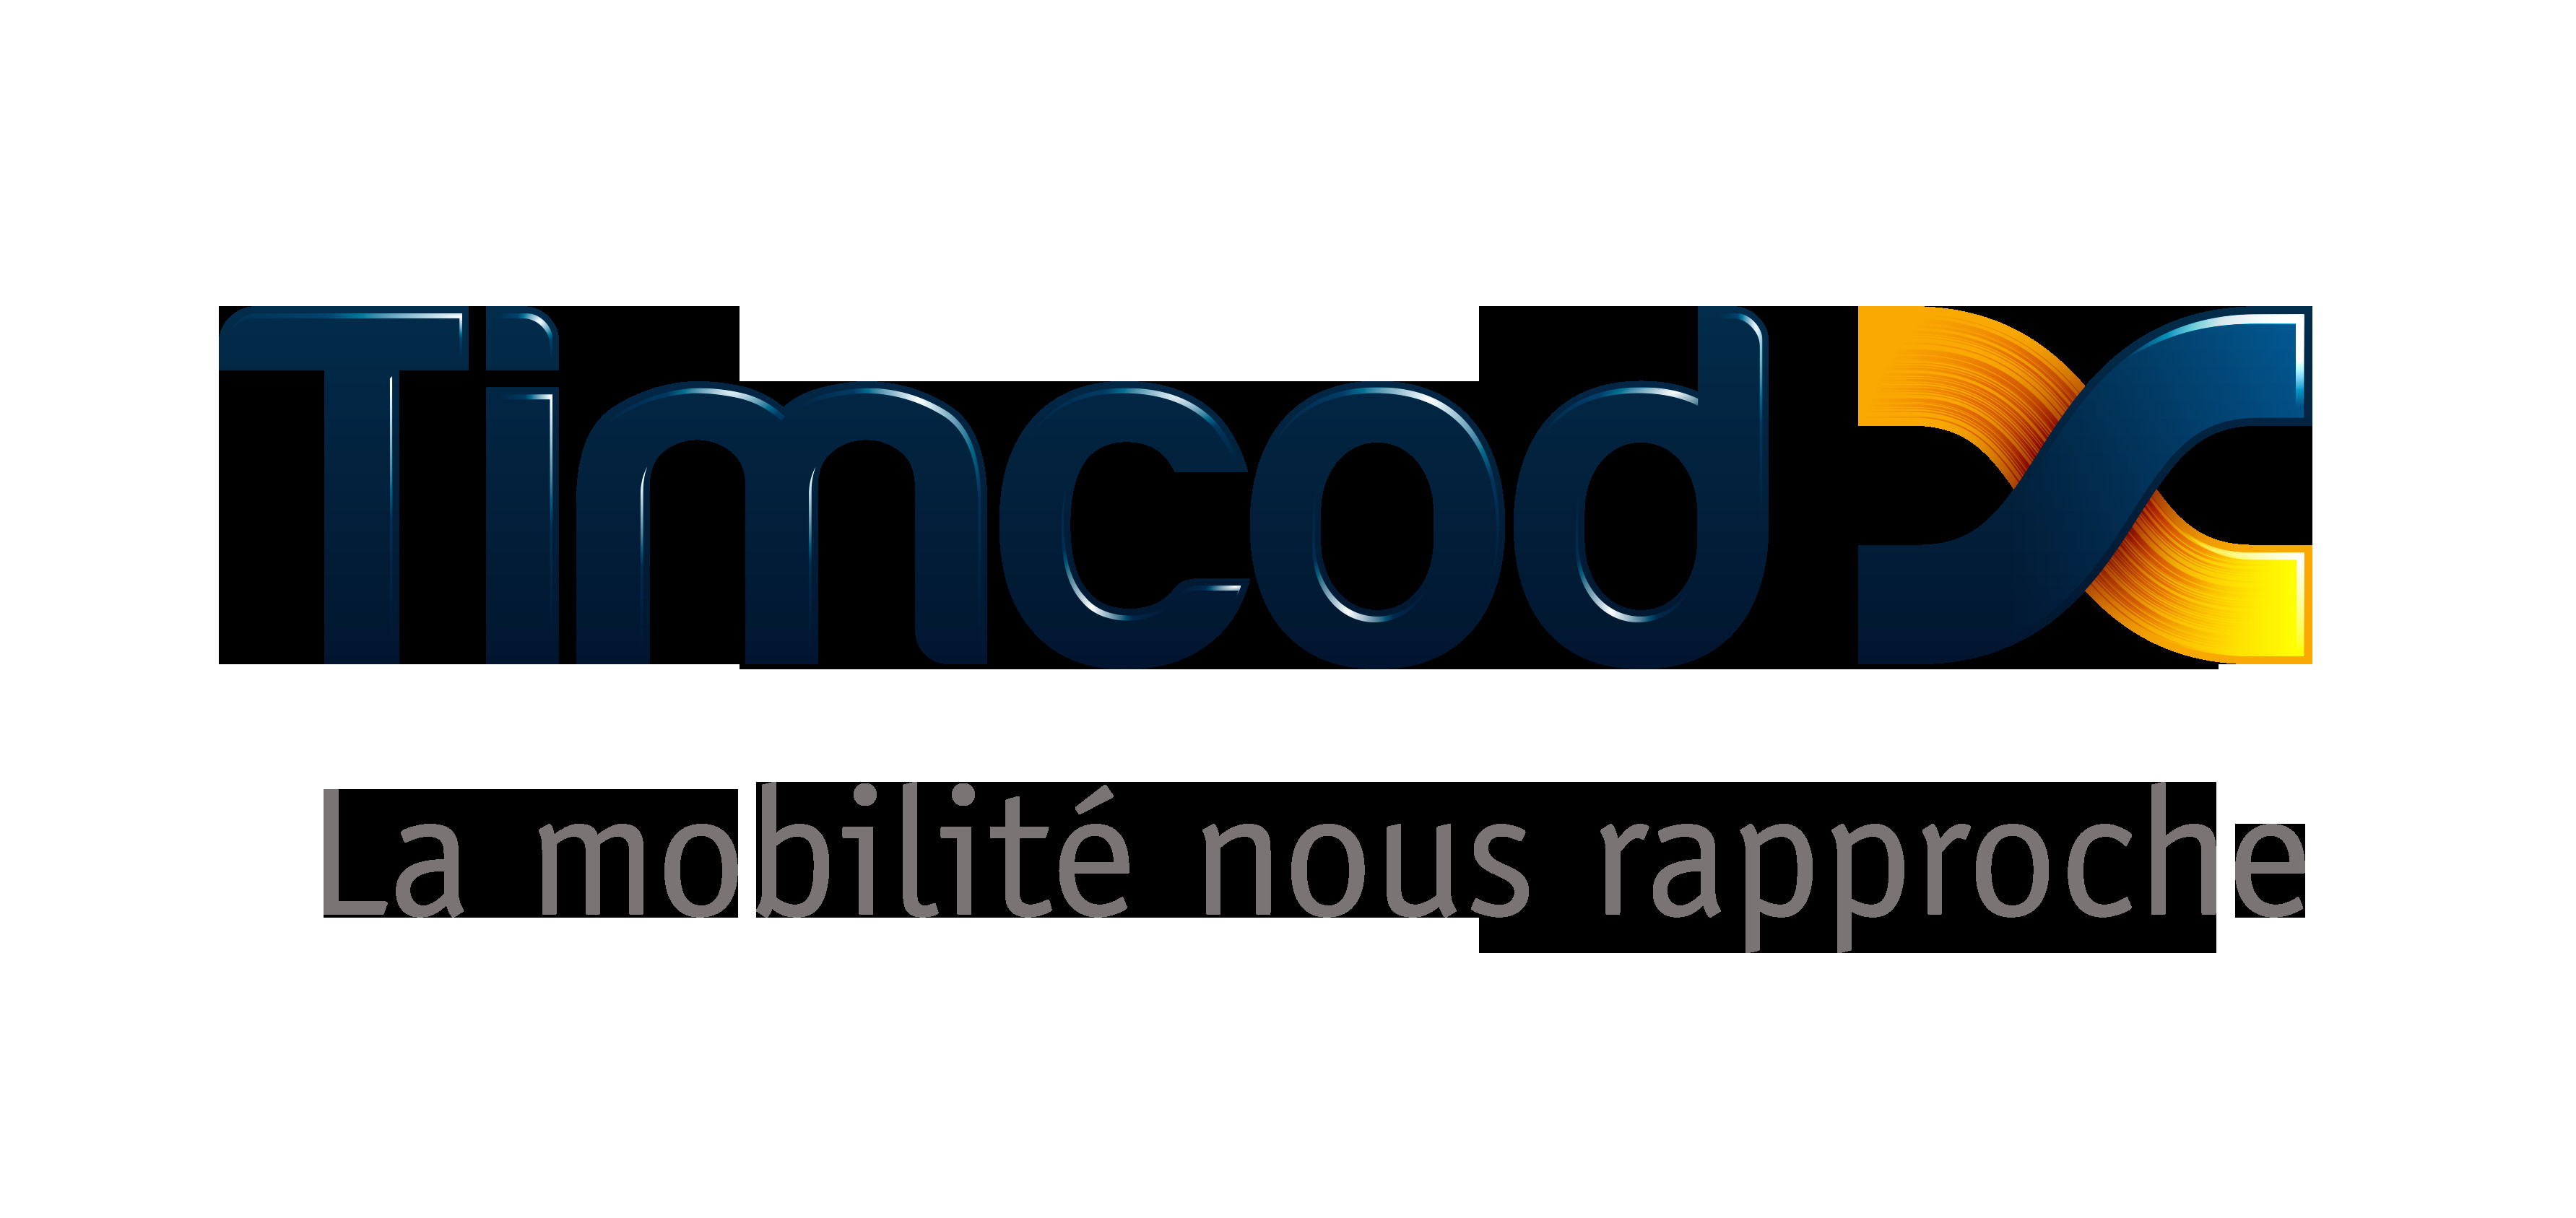 timcod 13290 aix en provence t 33 0 4 42 60 78 78 contact timcod fr www timcod fr partner